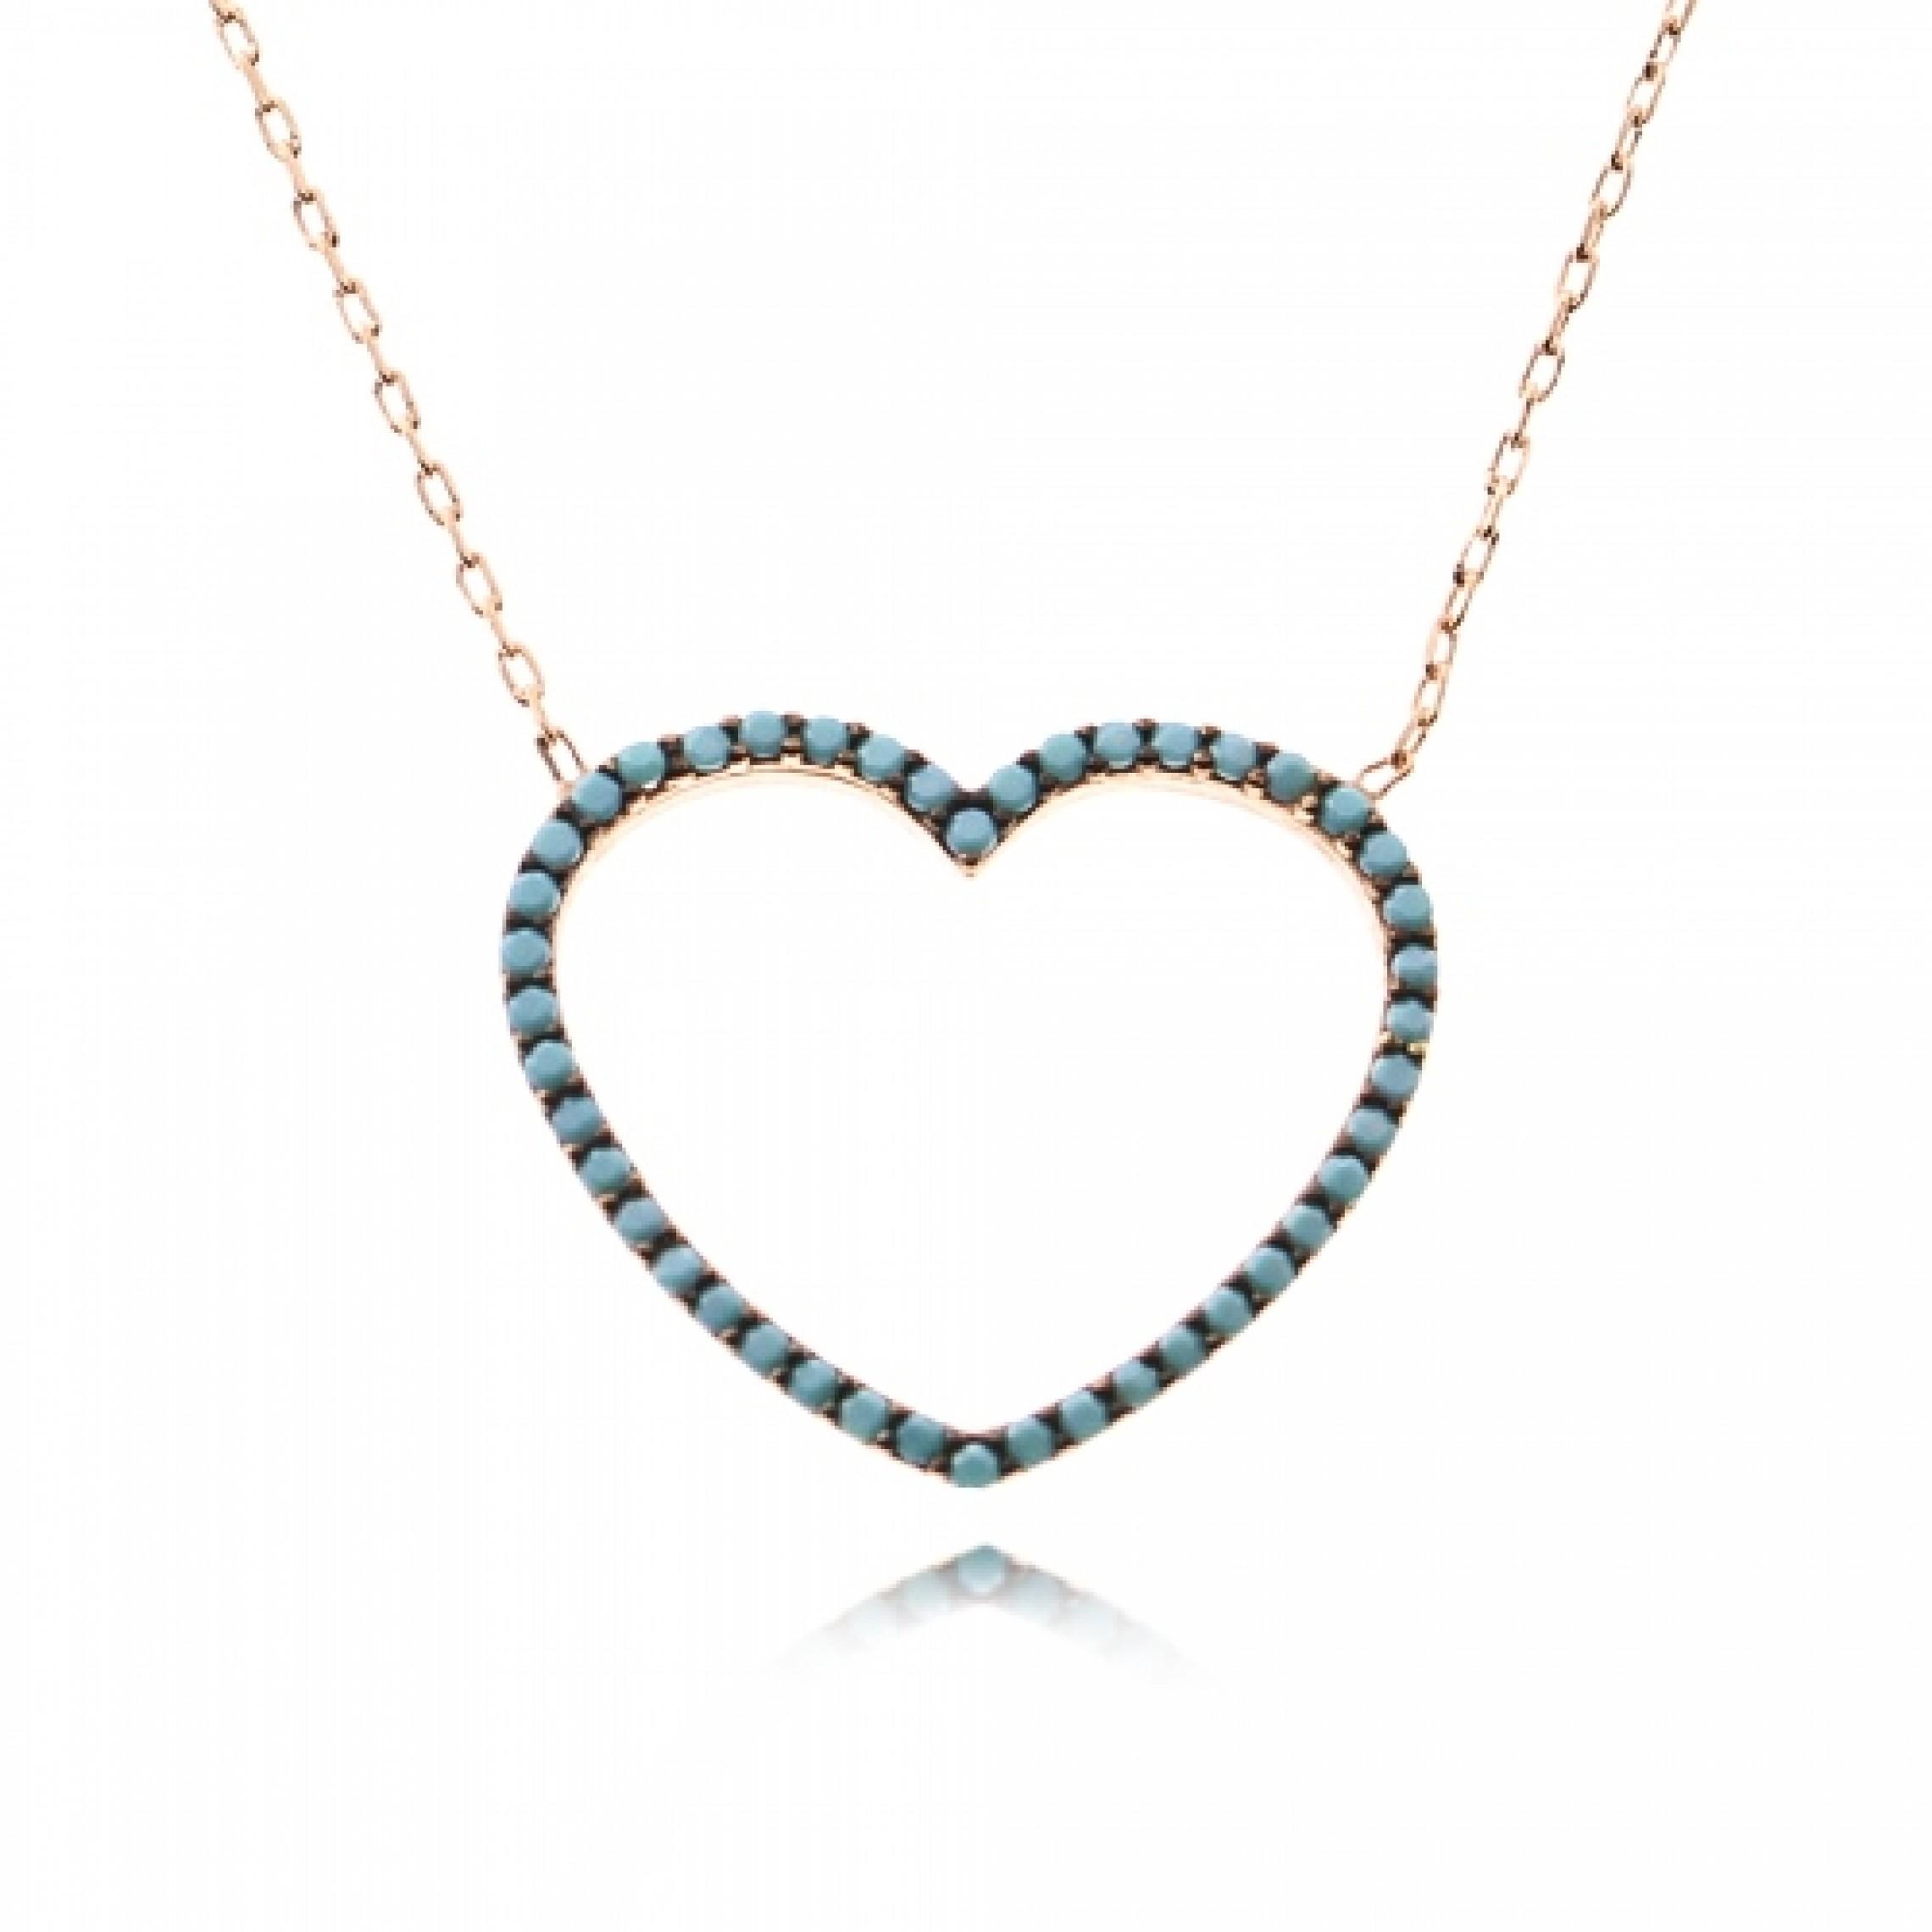 JN-190017 Evil Eye 925 Sterling Silver CZ Necklace Heart